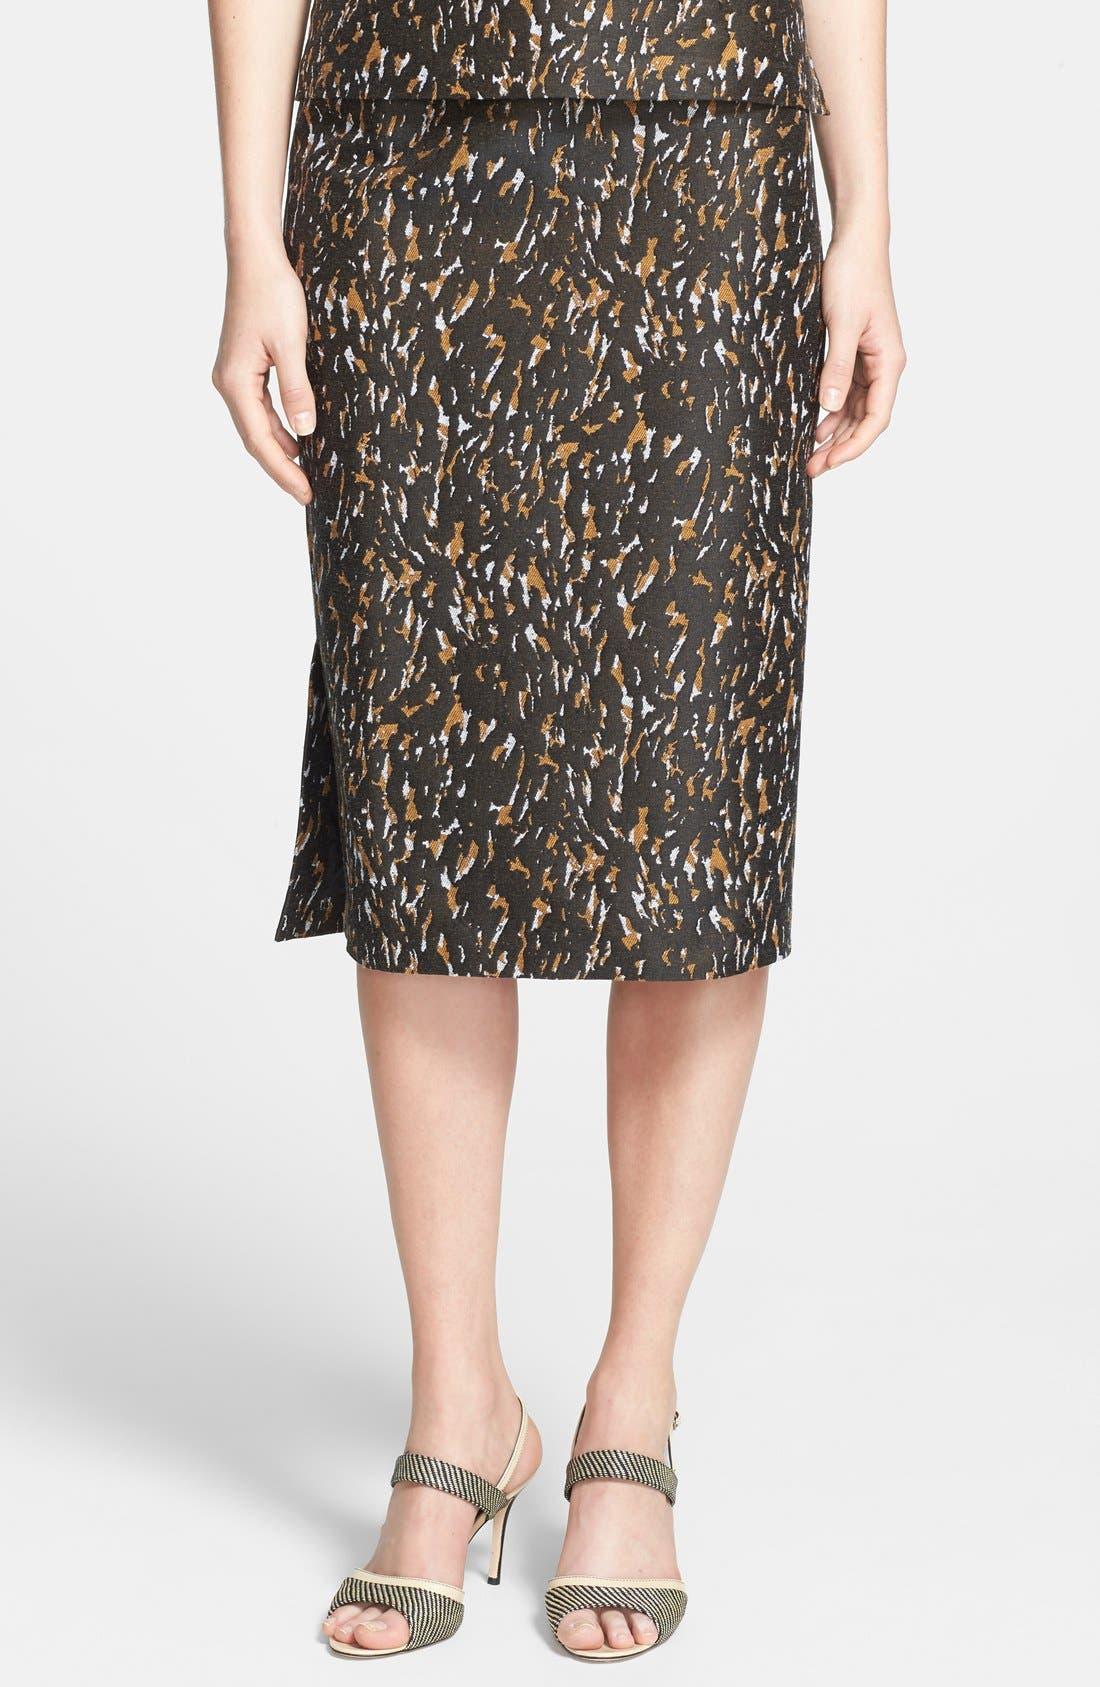 Alternate Image 1 Selected - Lafayette 148 New York 'Priscilla - Urban Jacquard' Skirt